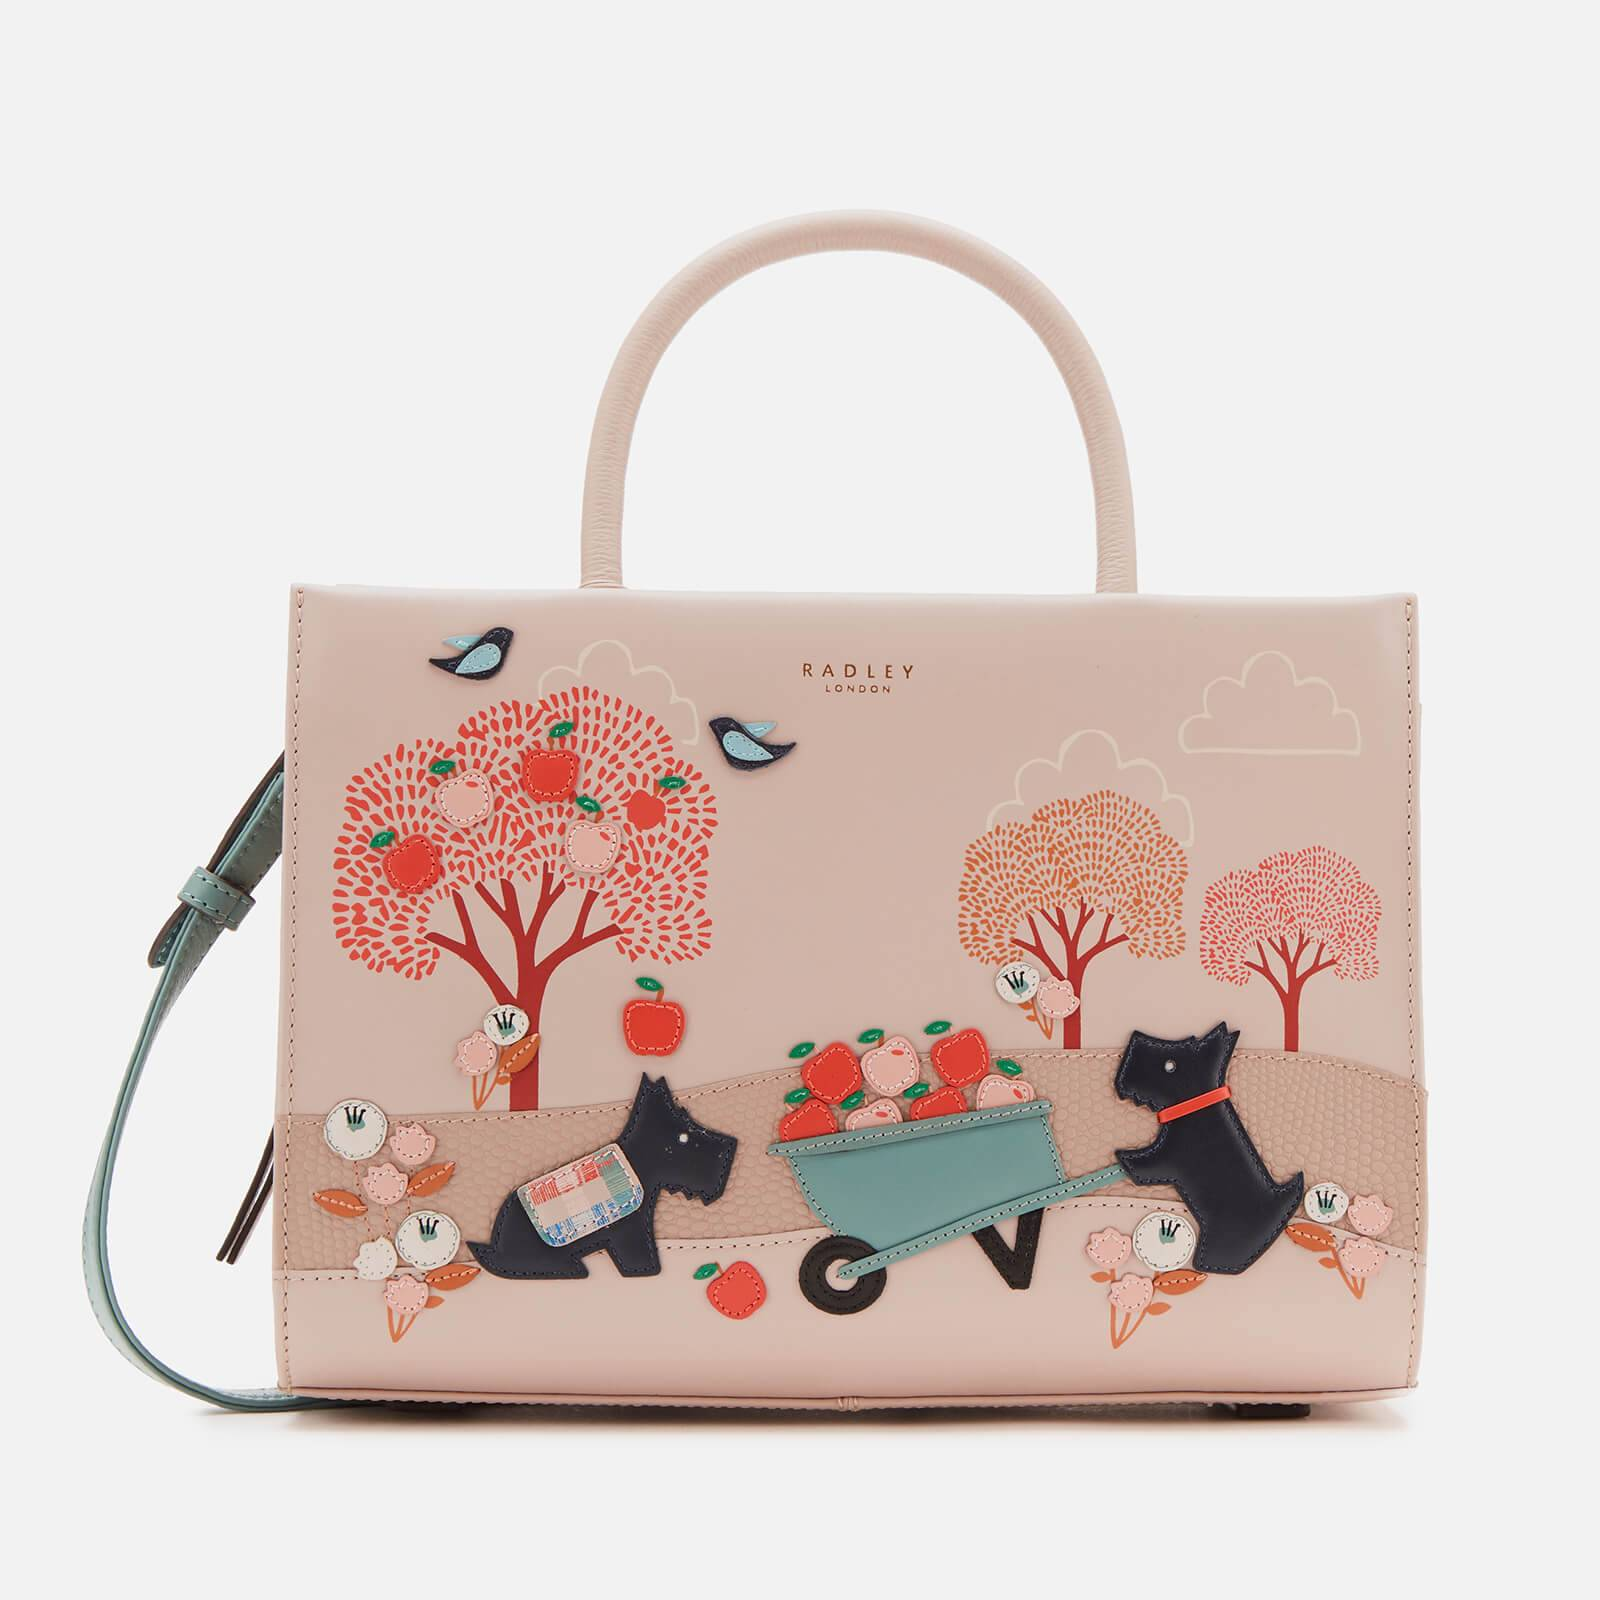 Radley Women's To the Core Medium Grab Multiway Bag - Dove Grey